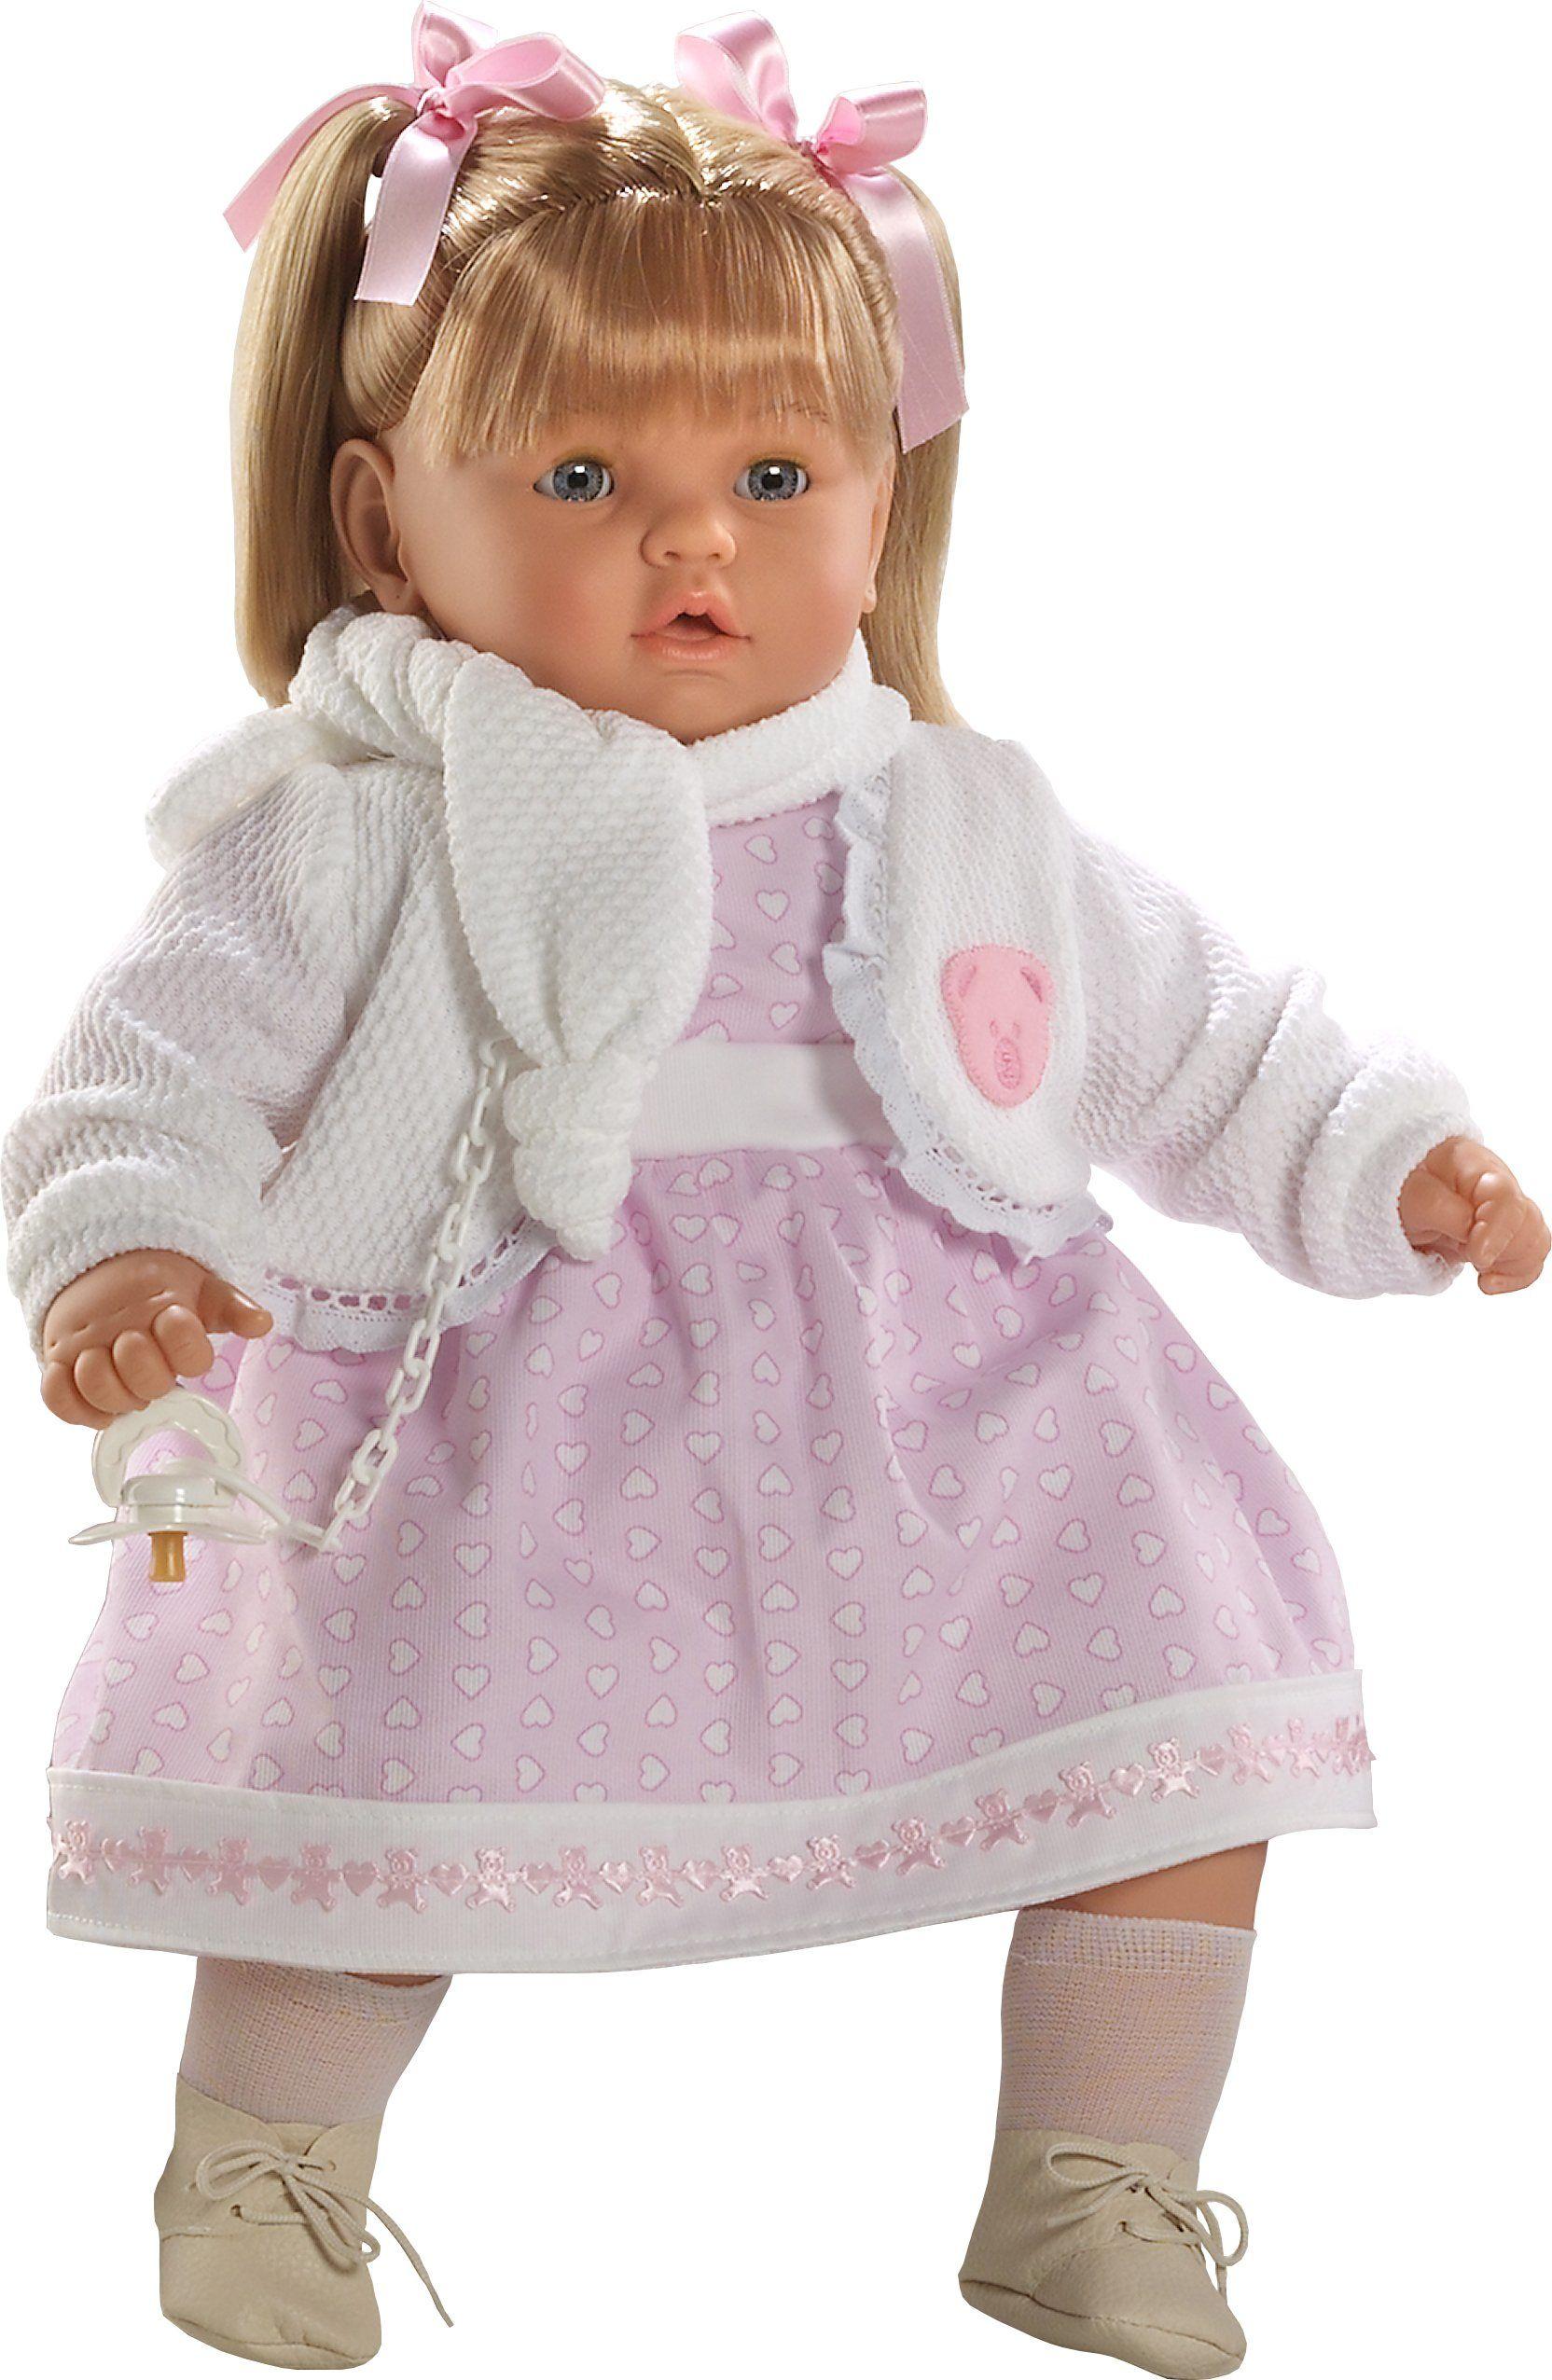 Berbesa 8034 Baby Dulzona lalka Cries to remove his smoczek, 62 cm, wielokolorowa